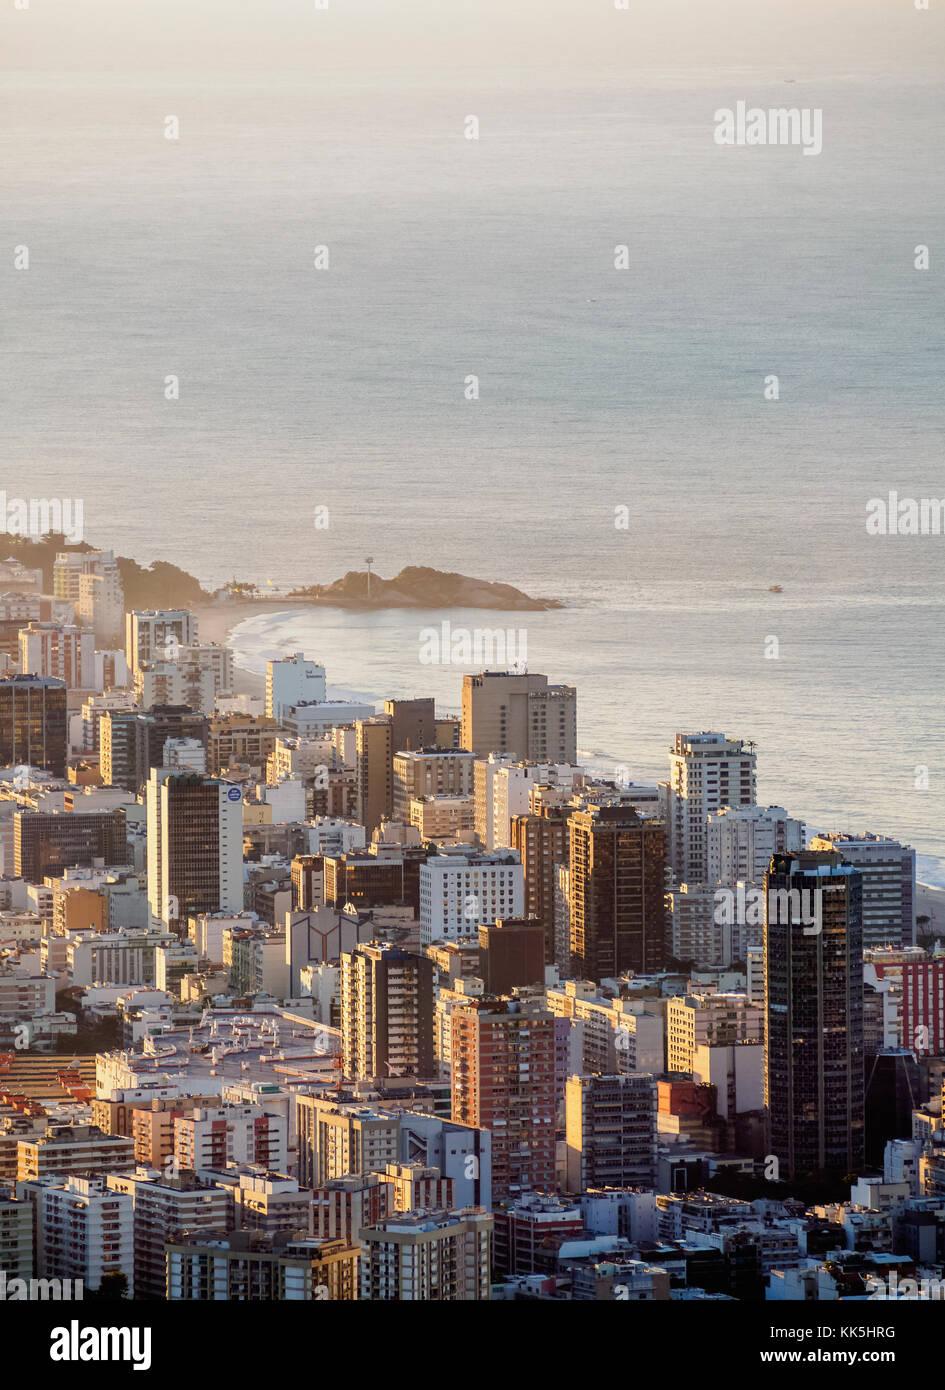 Ipanema Neighbourhood at sunrise, elevated view, Rio de Janeiro, Brazil Stock Photo